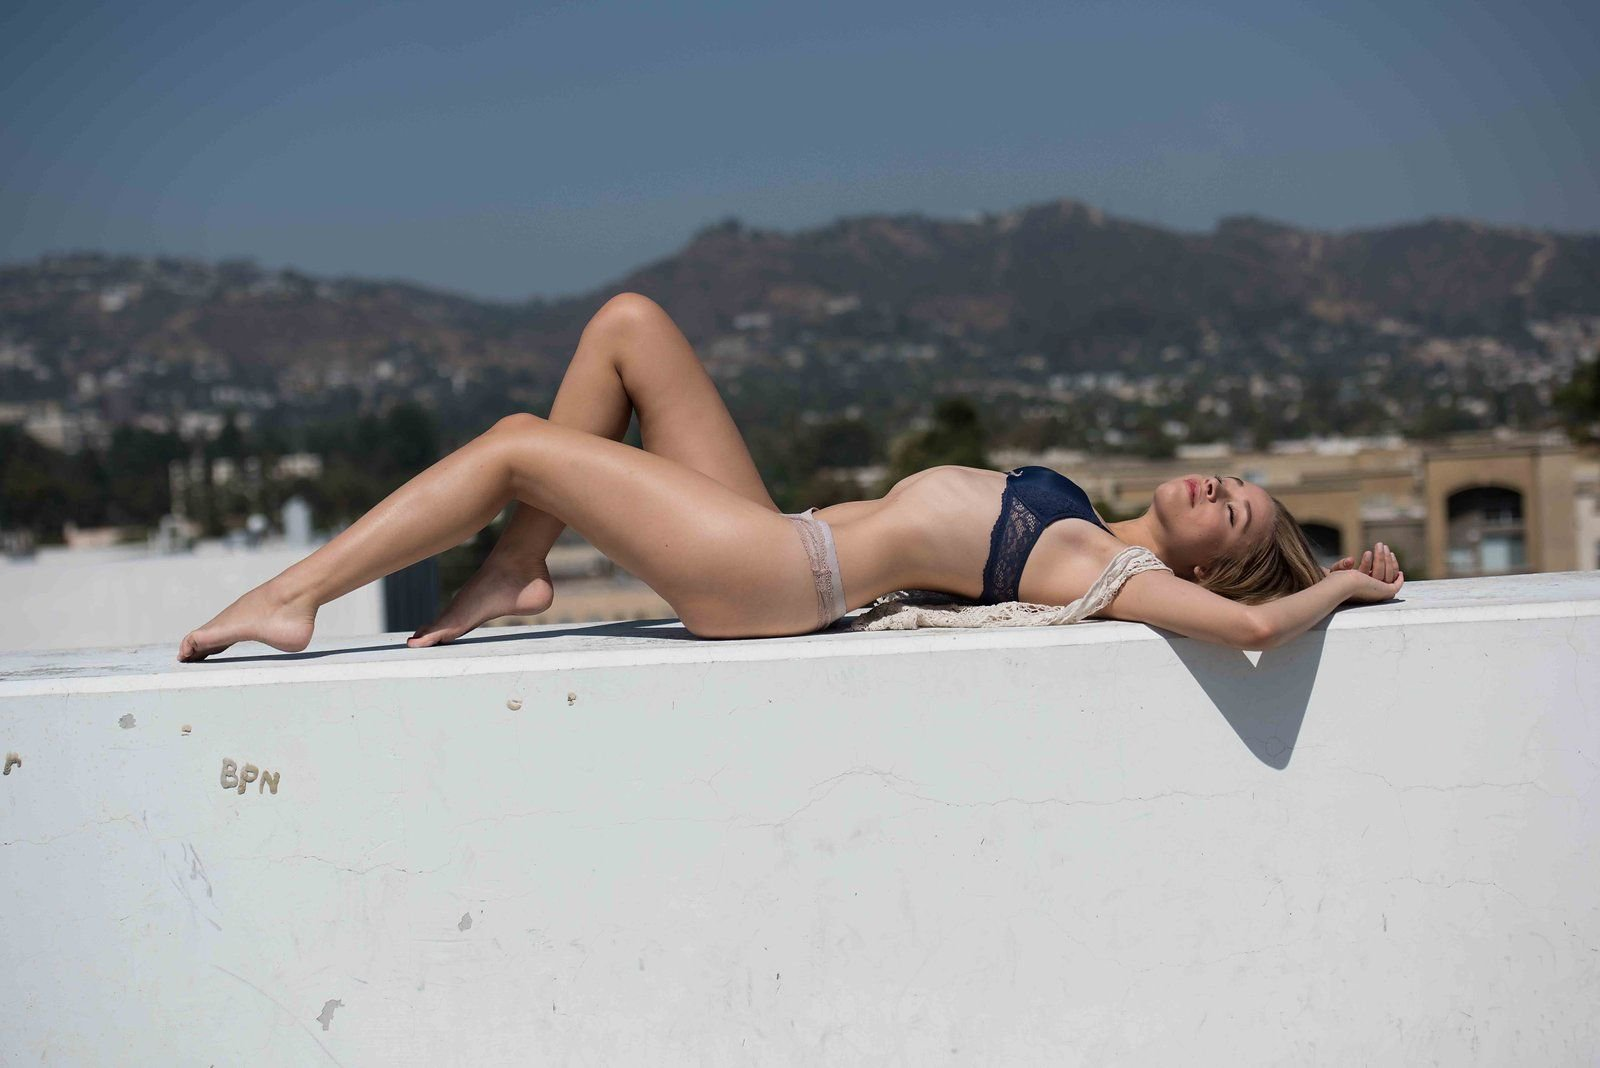 Vienna Kendall Leaked Nude Photoshoot